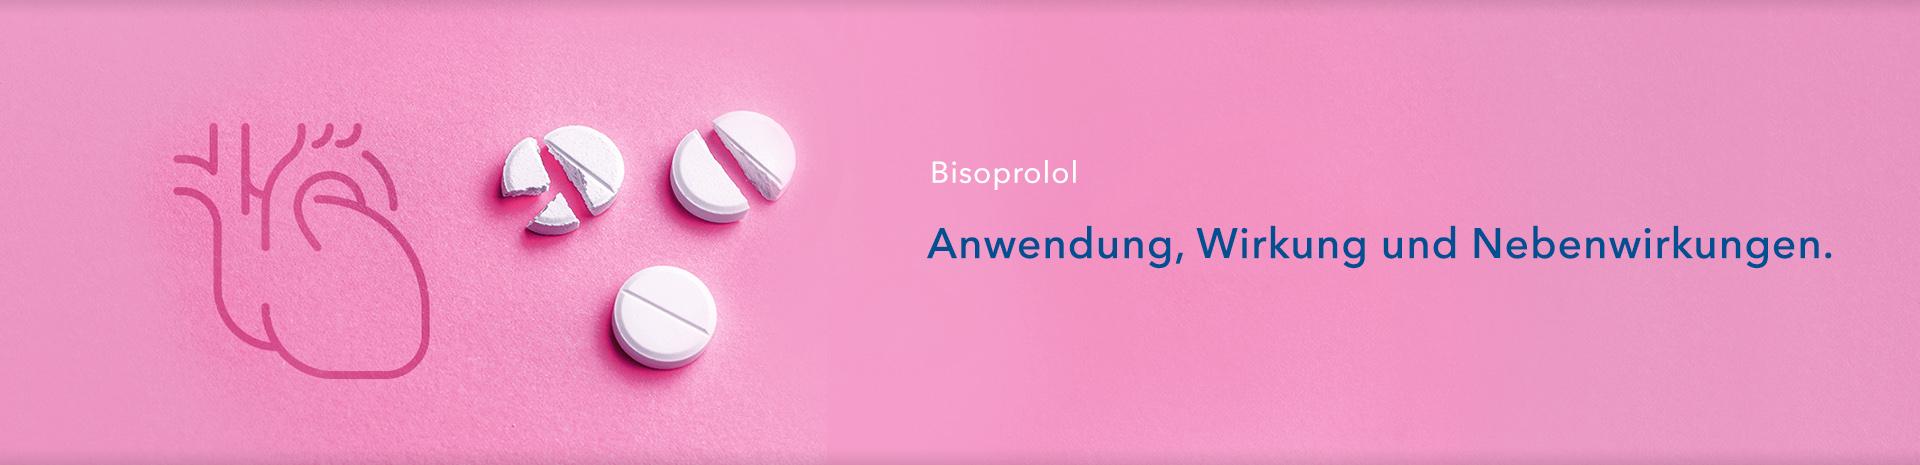 Ratgeber zu Bisoprolol